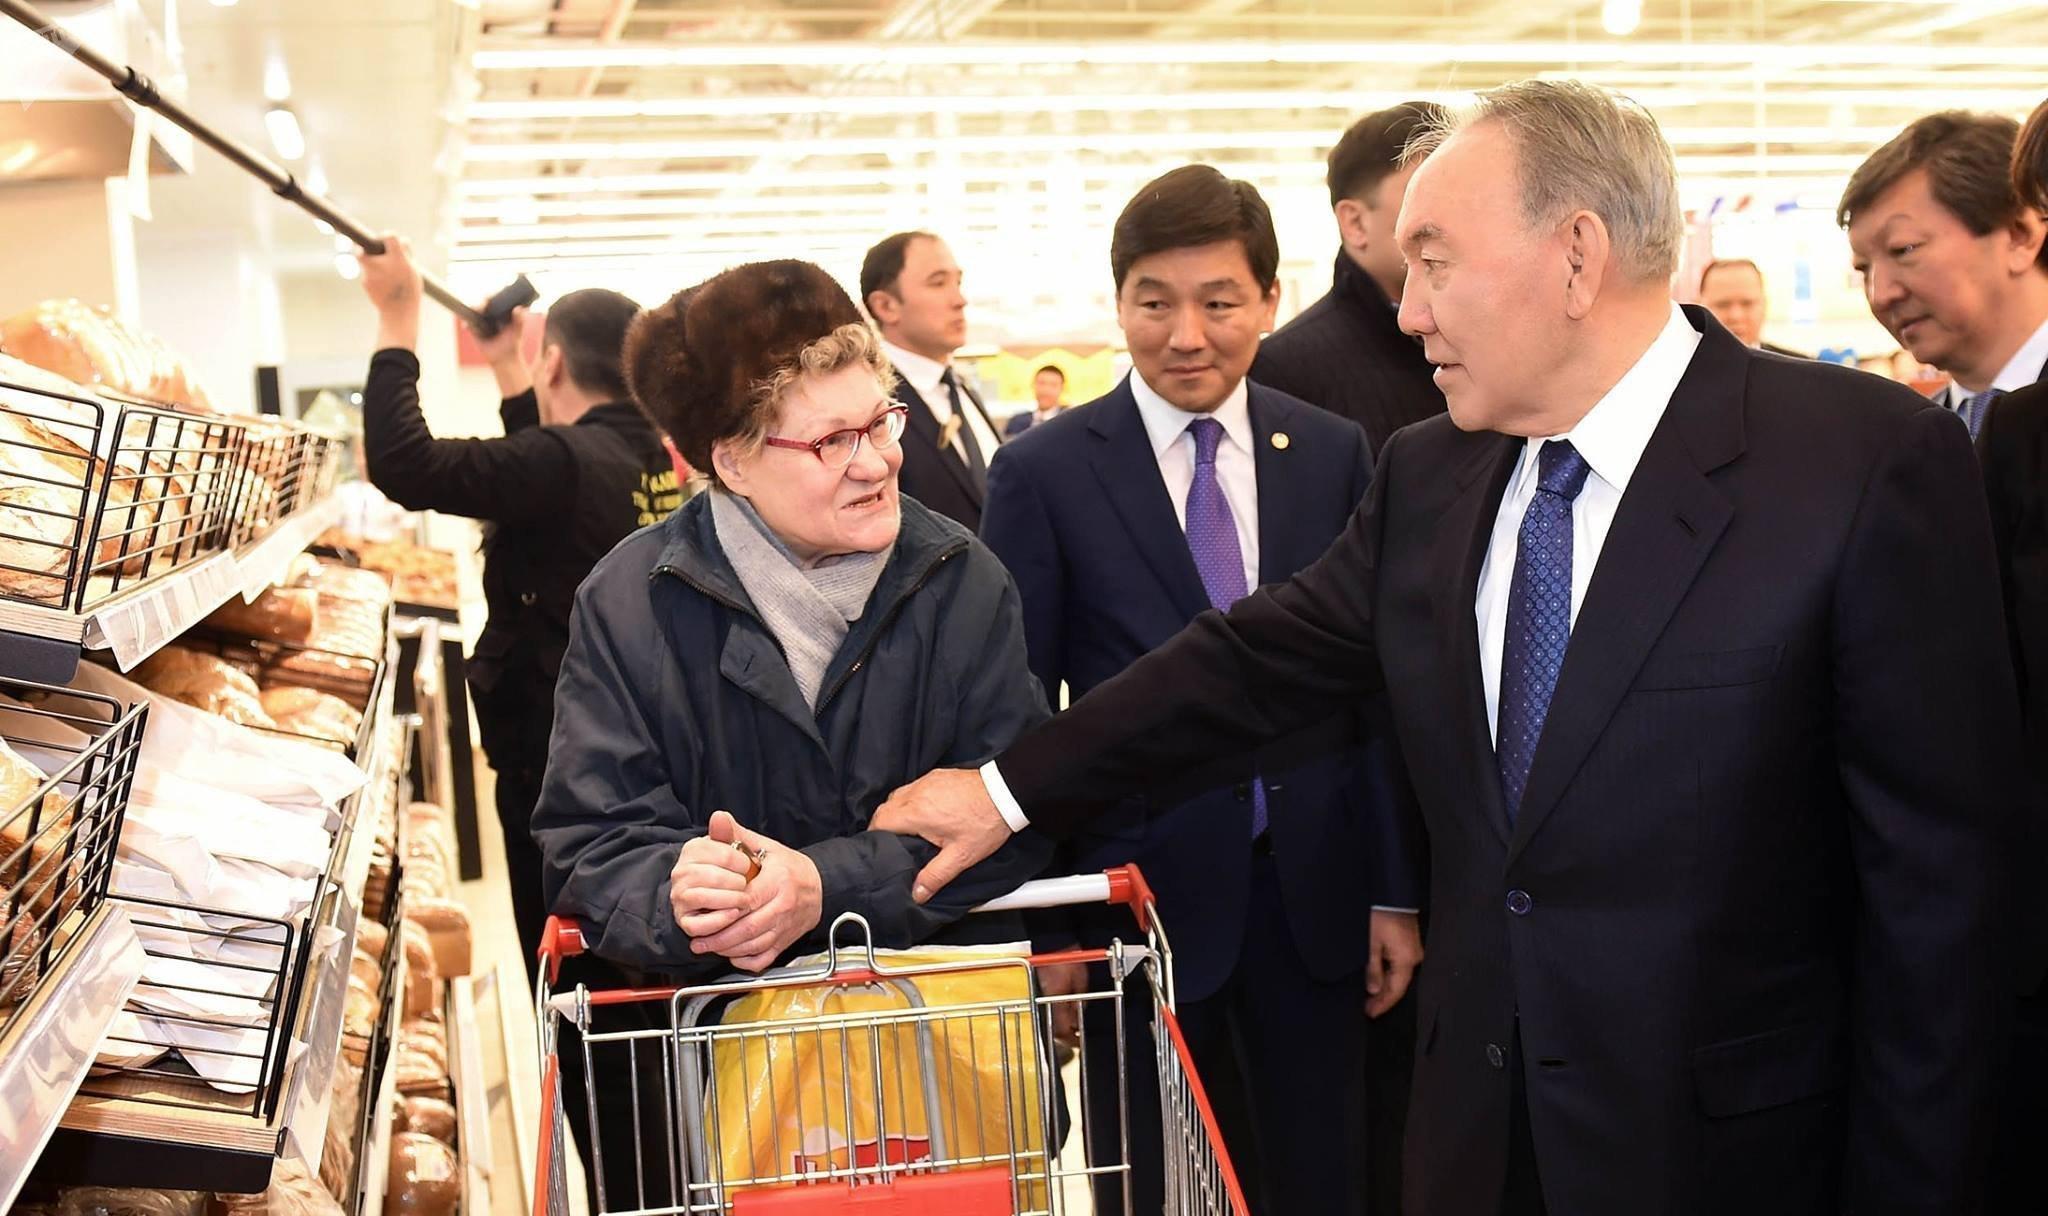 Нурсултан Назарбаев на открытии гипермаркета Carrefour